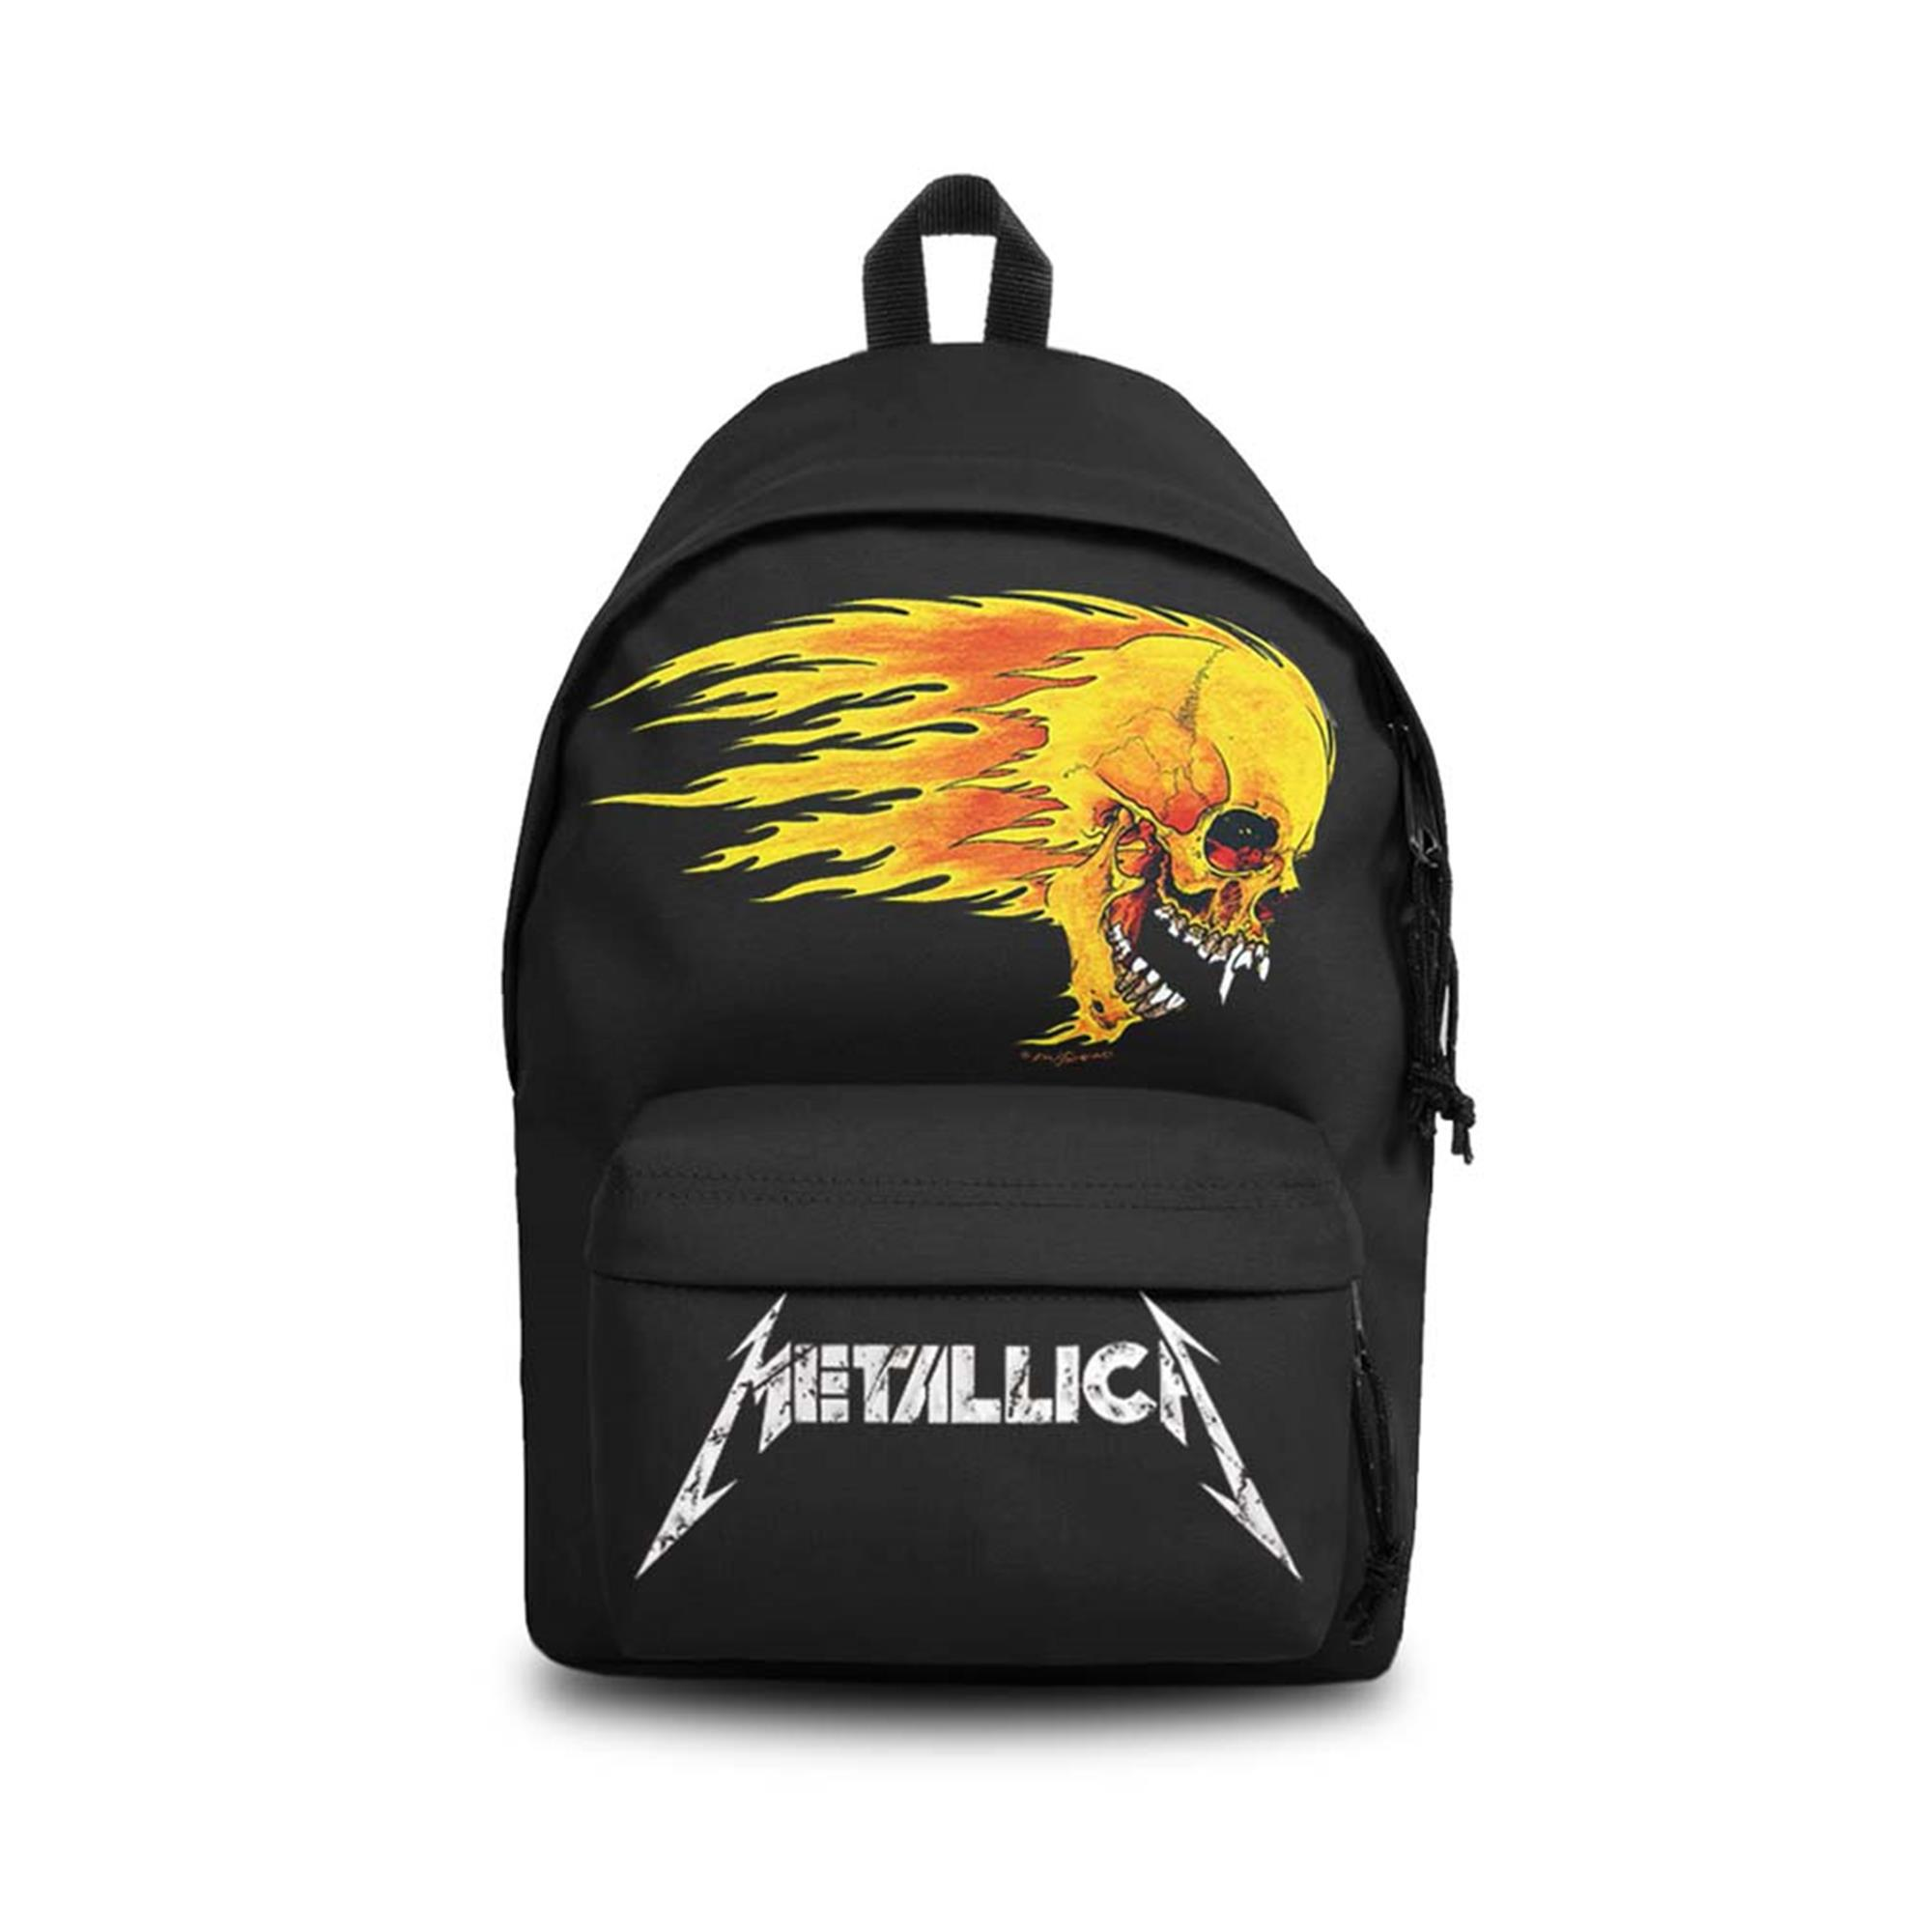 Metallica Pushead Flame Daypack